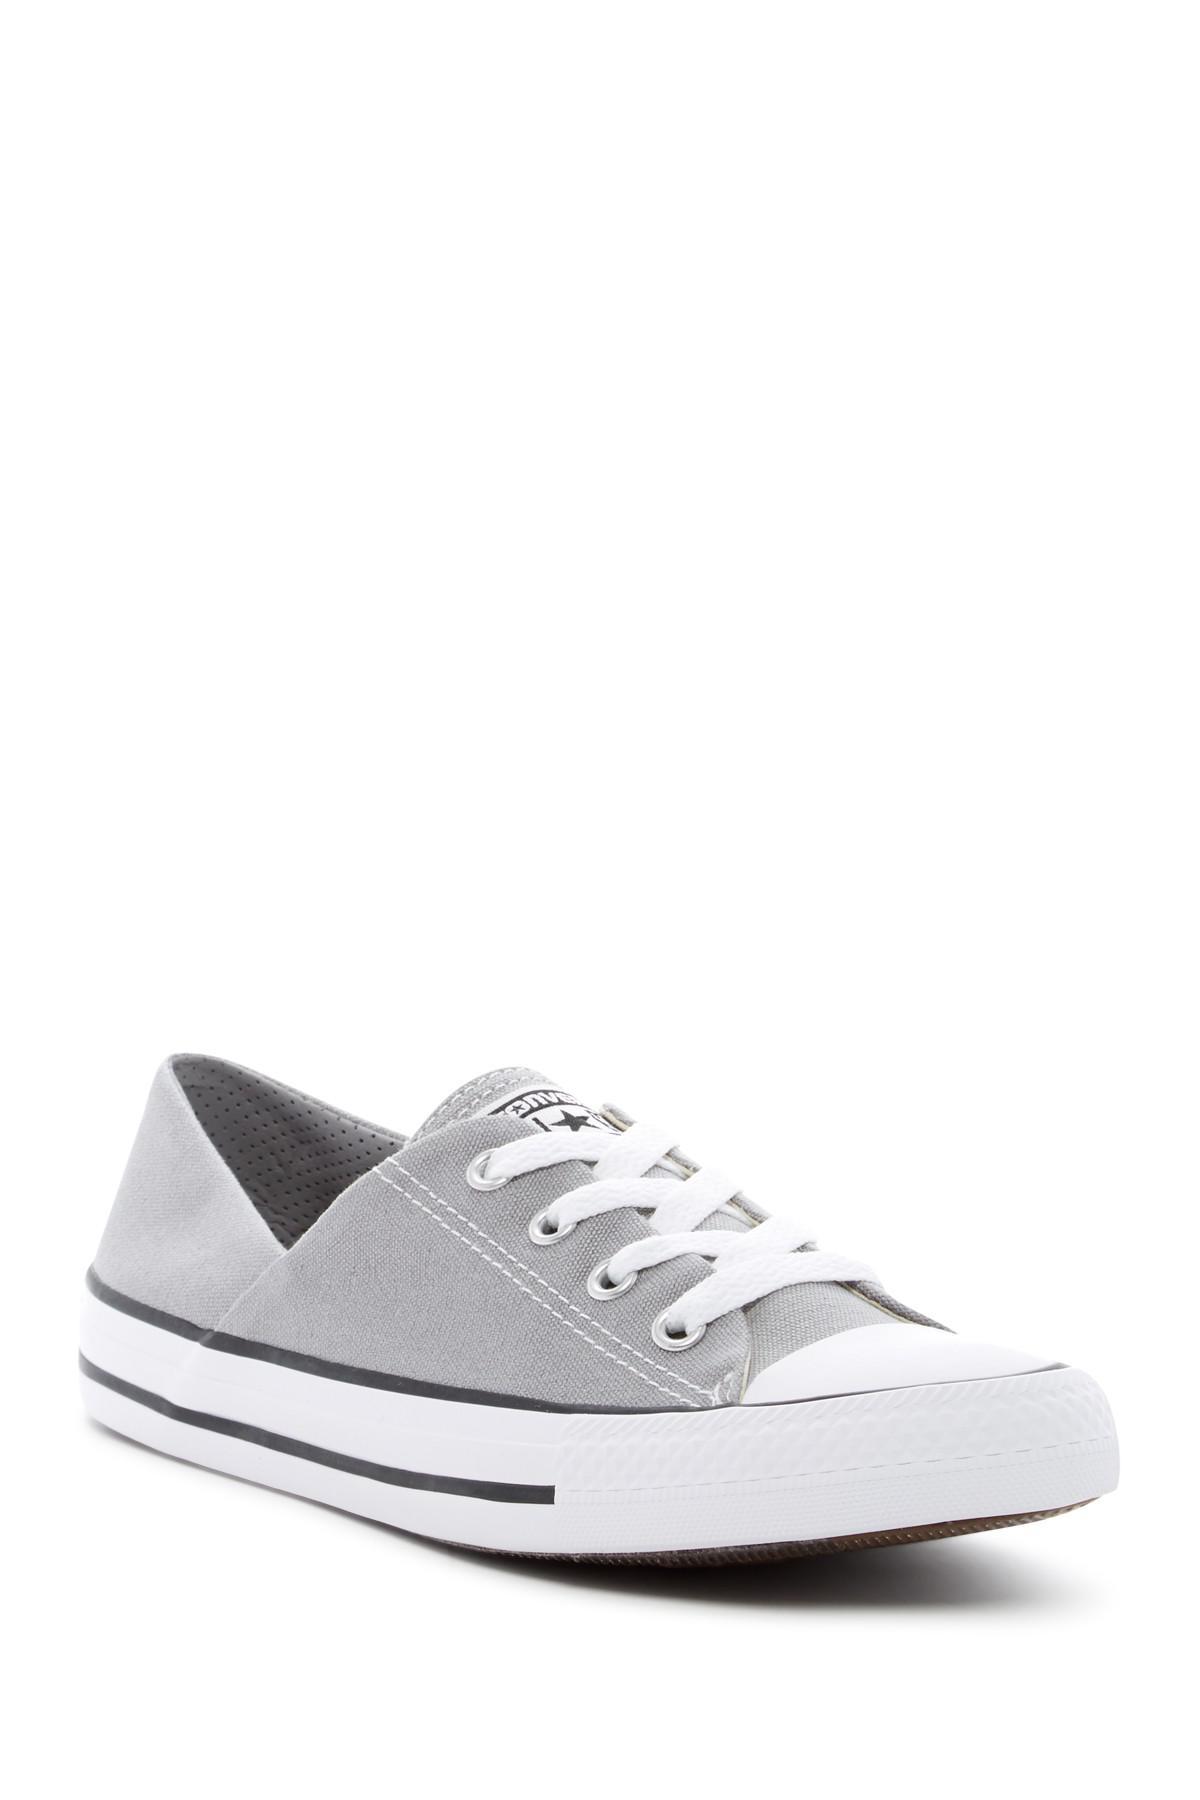 5f5d97f6e52a93 Converse Chuck Taylor All Star Coral Oxford Sneakers (women) in ...